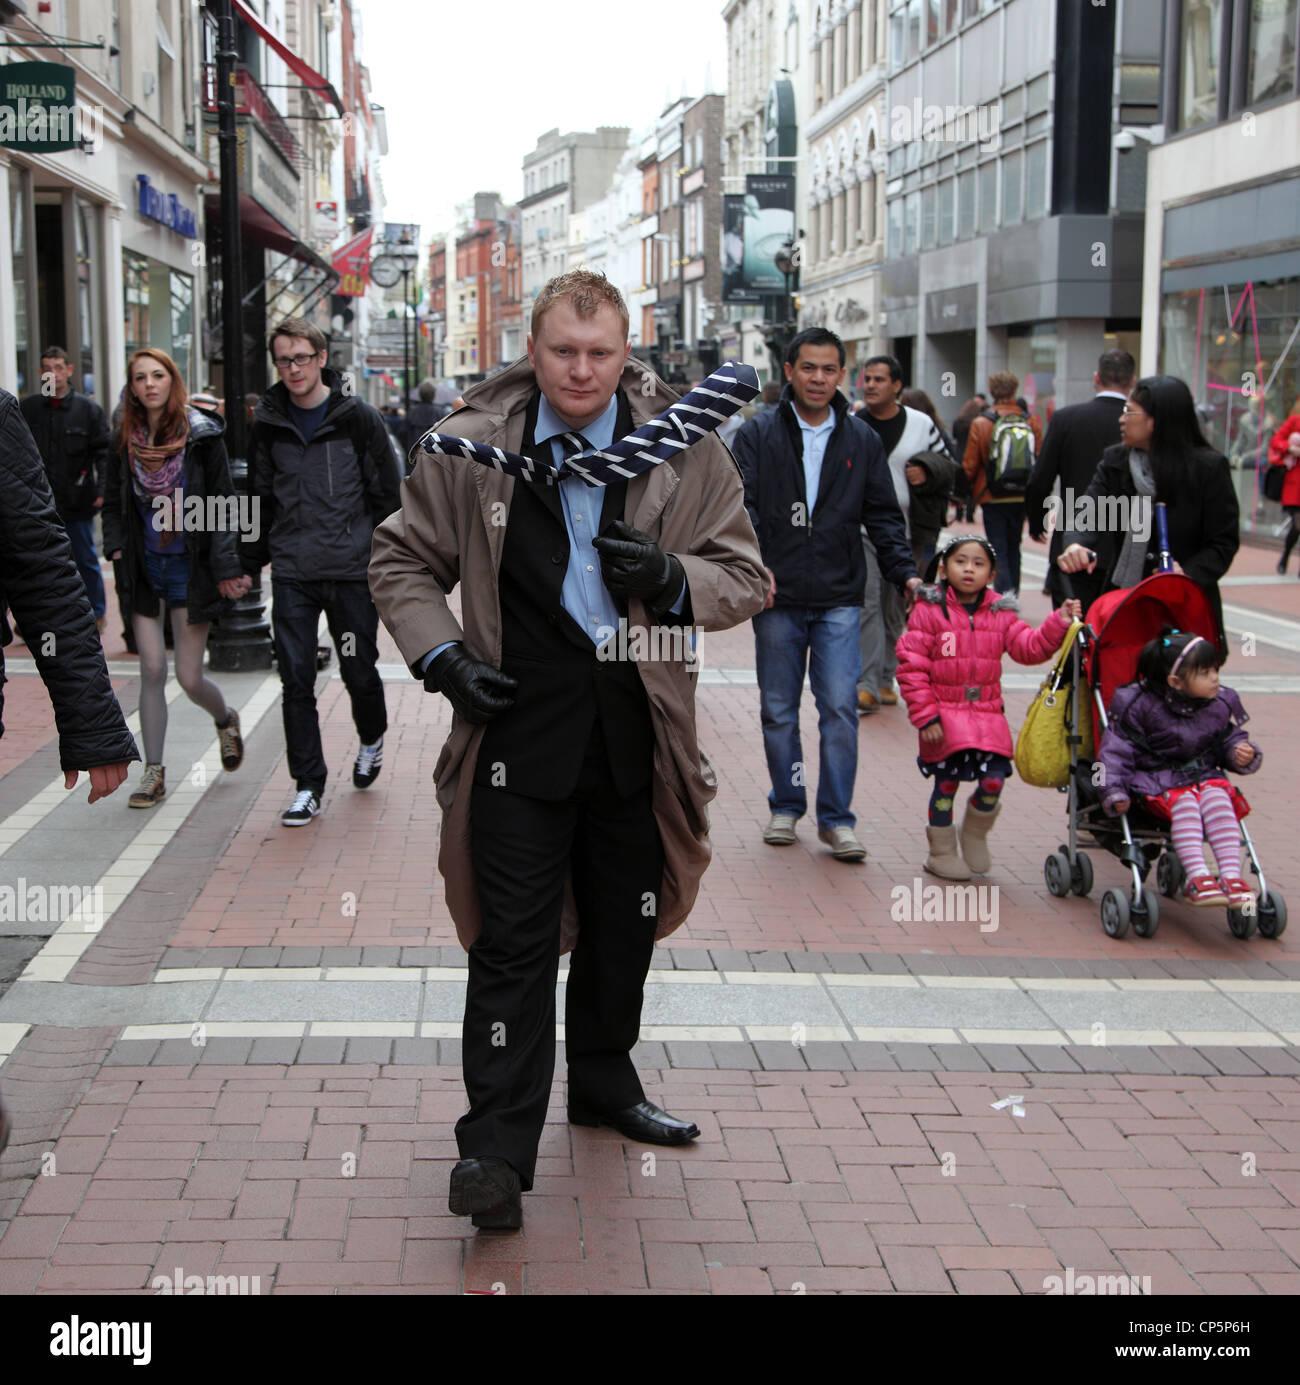 living statue performance artist, Grafton Street, Dublin, Ireland - Stock Image